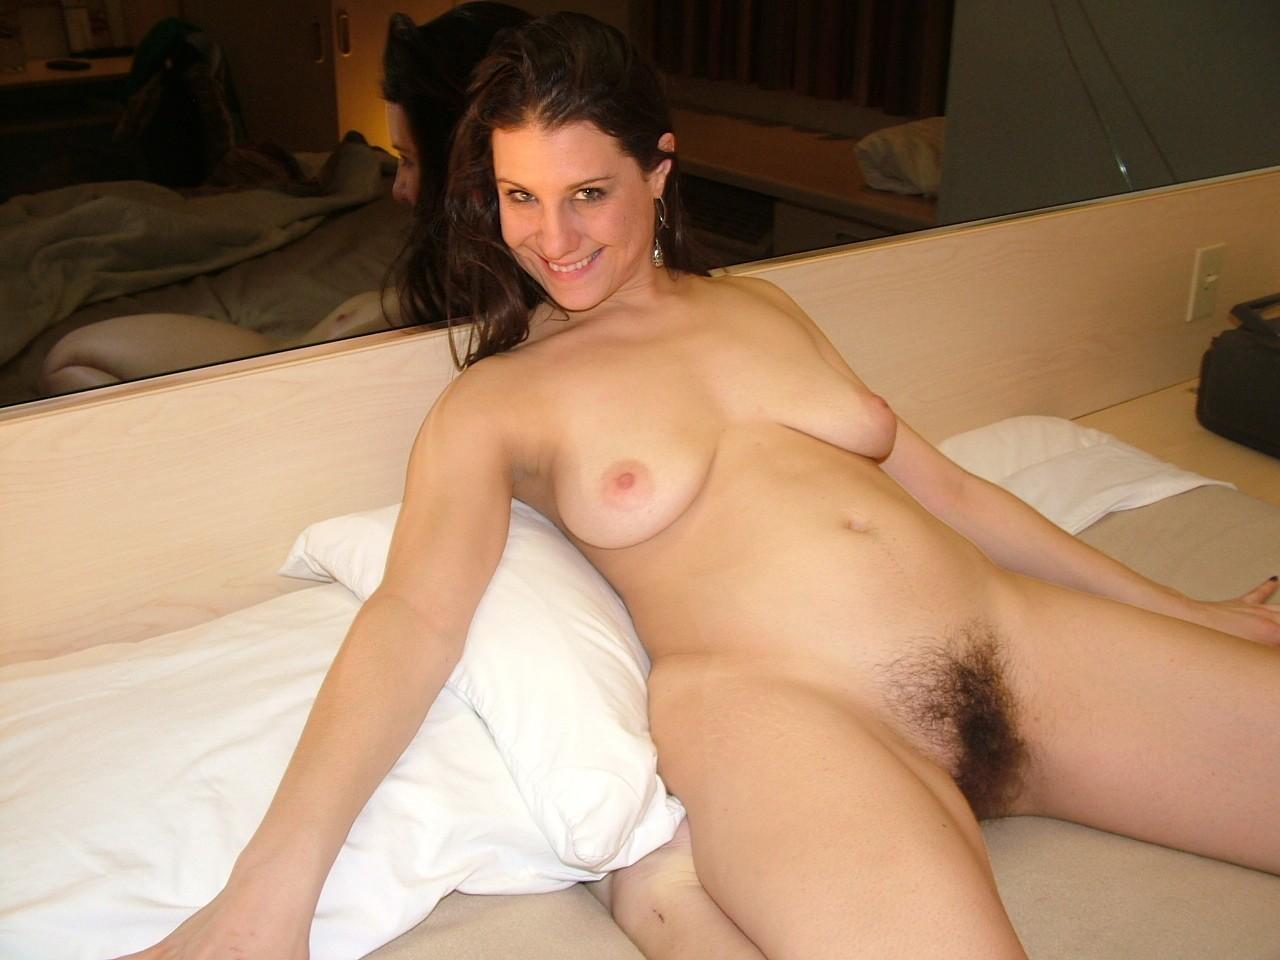 Naked hairy women nude bush